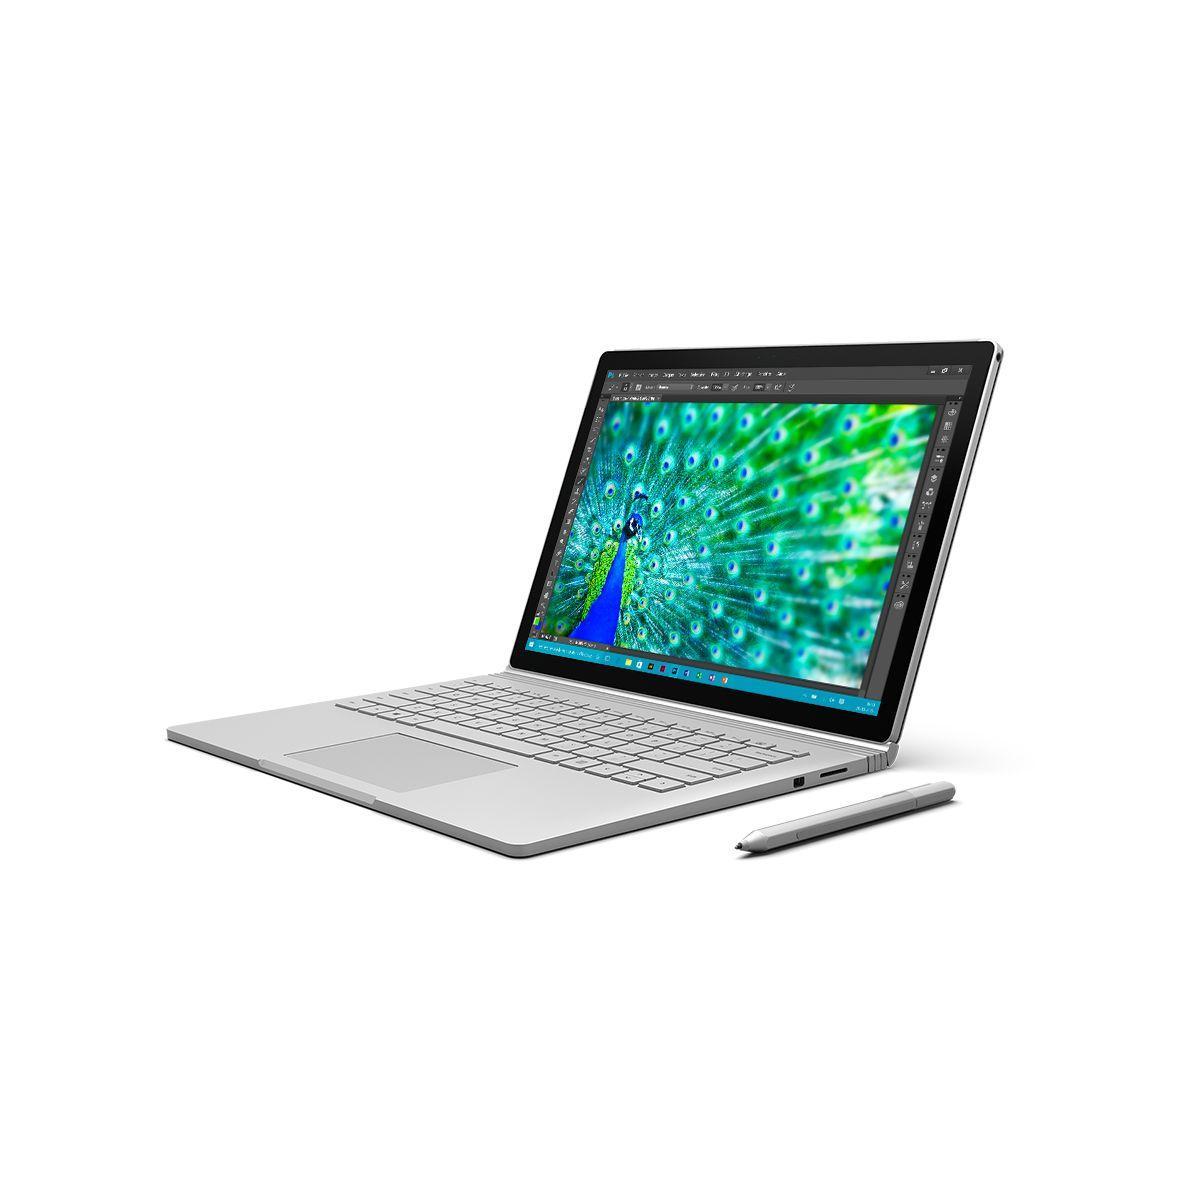 Microsoft surface book 512go intel i7 16go (photo)